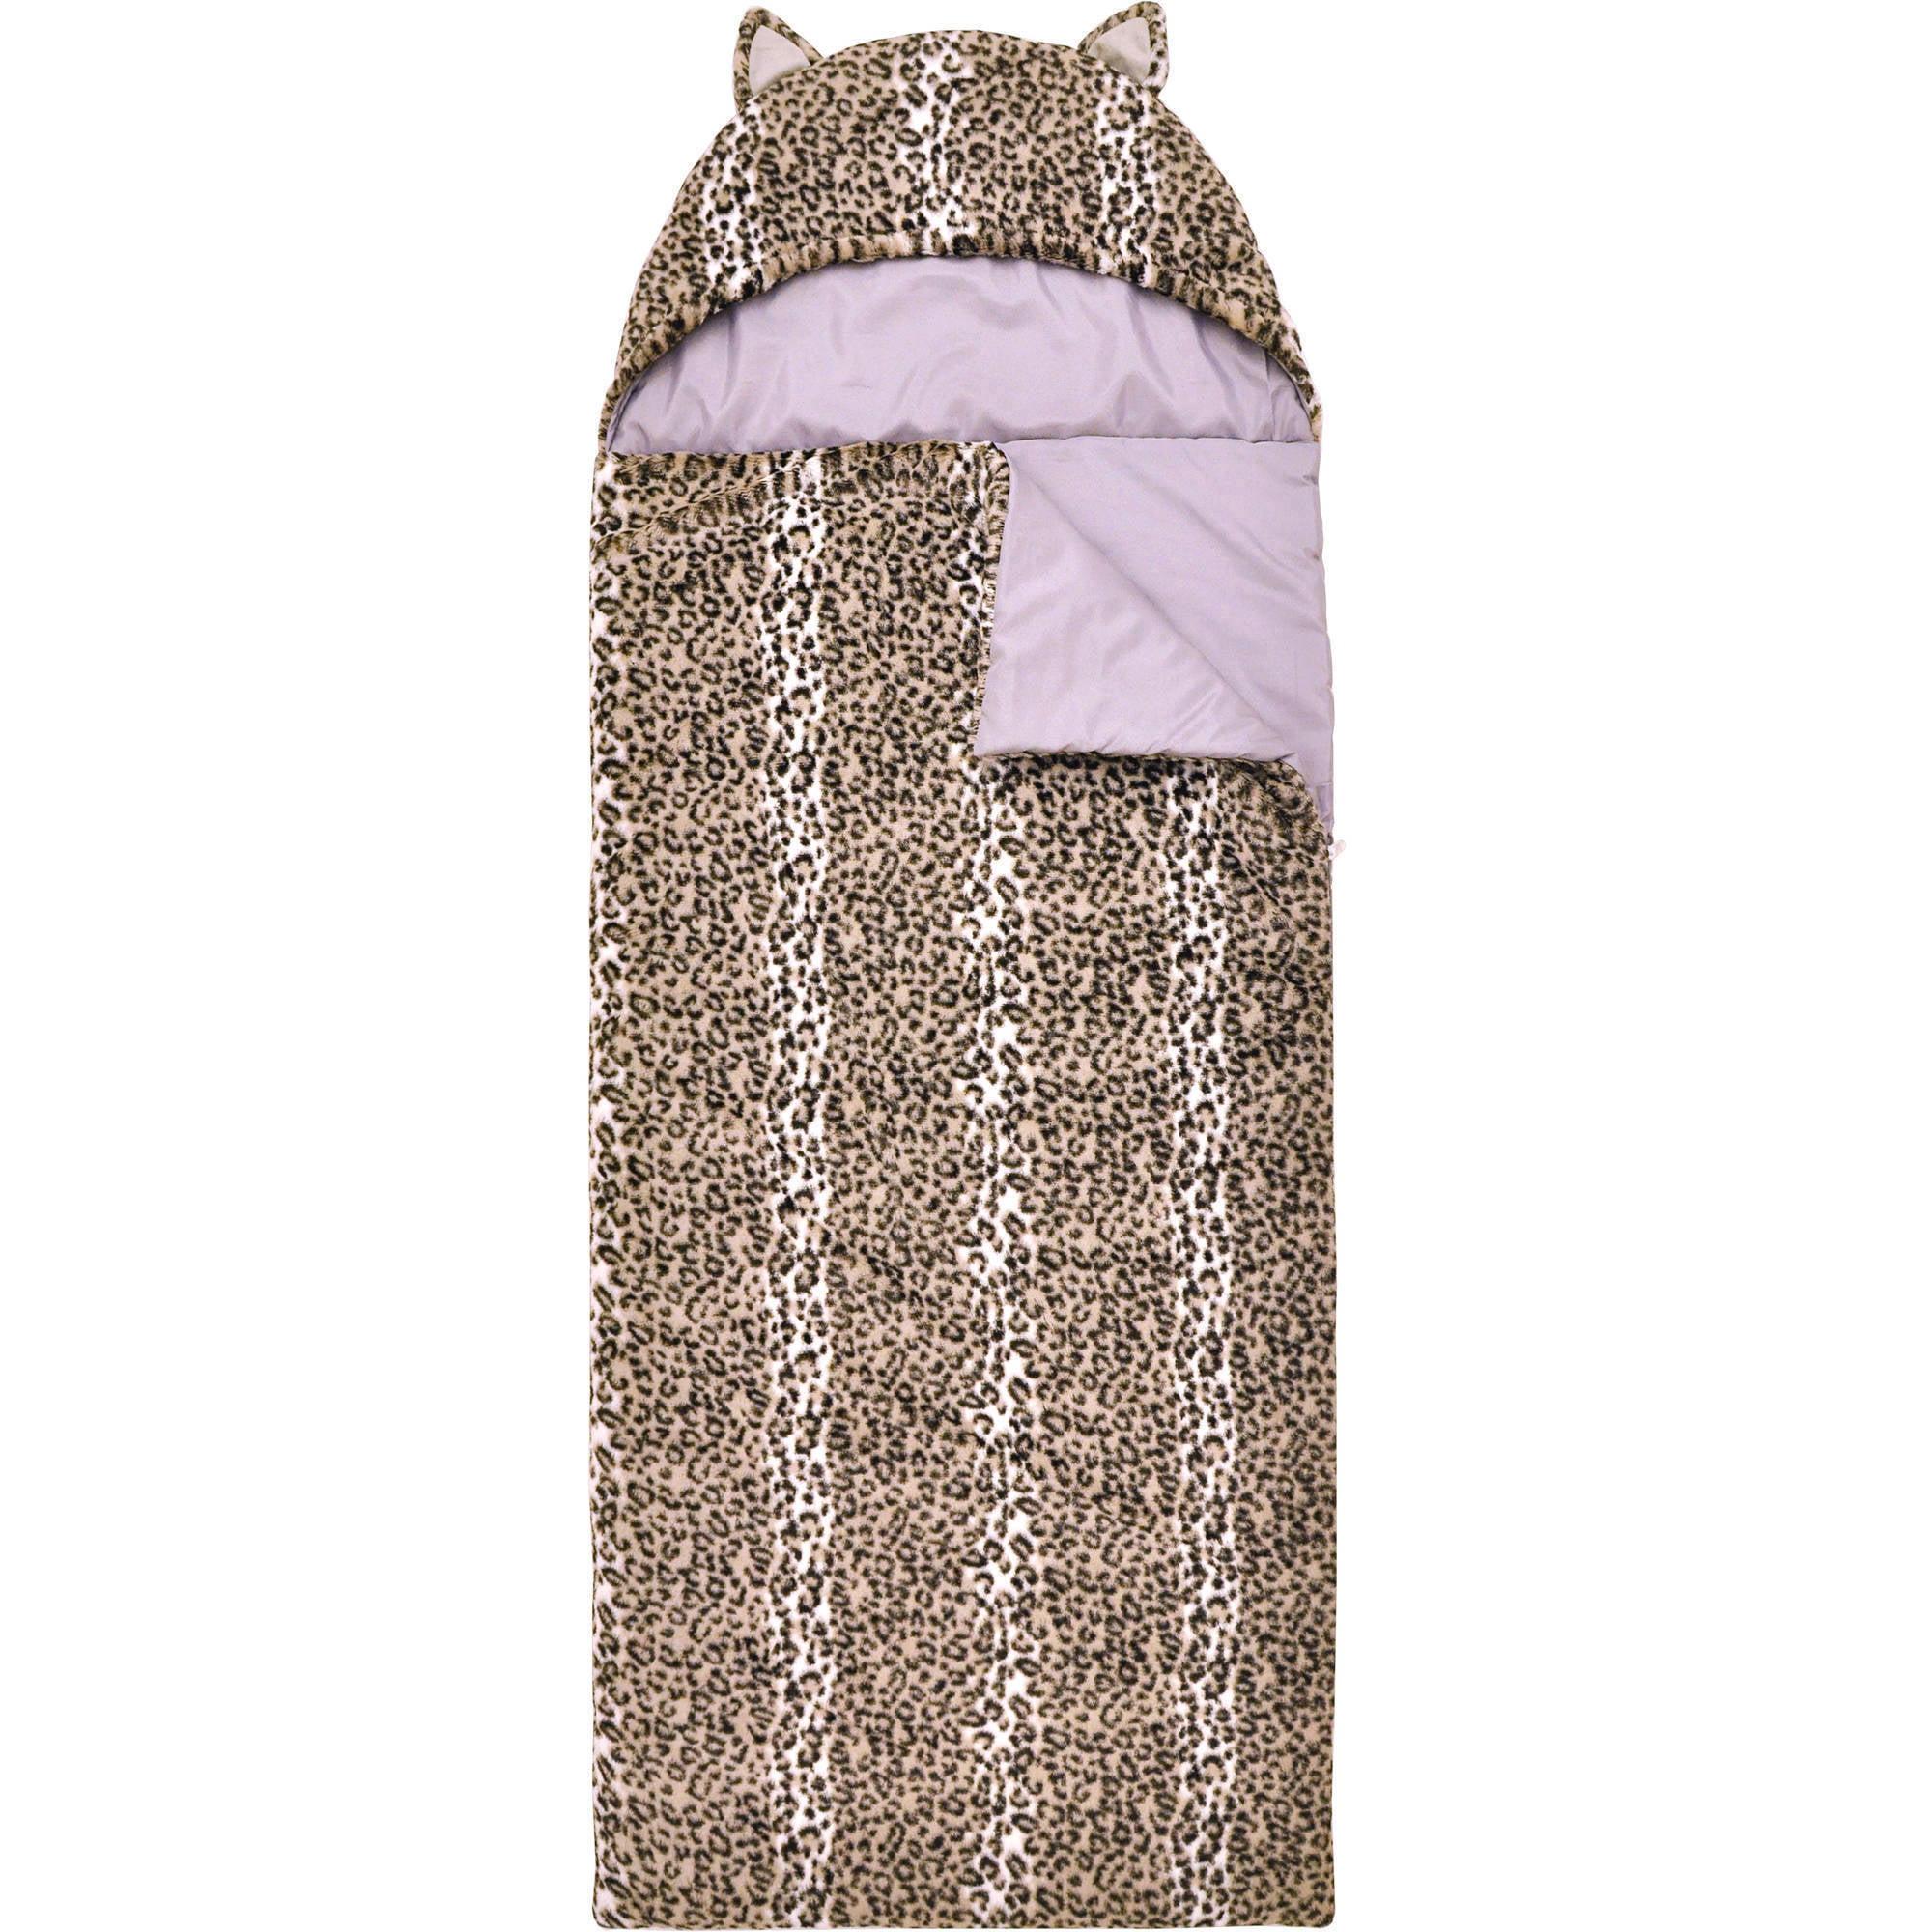 Mainstays Kids Snow Leopard Faux Fur Cuddly Sleeping Bag